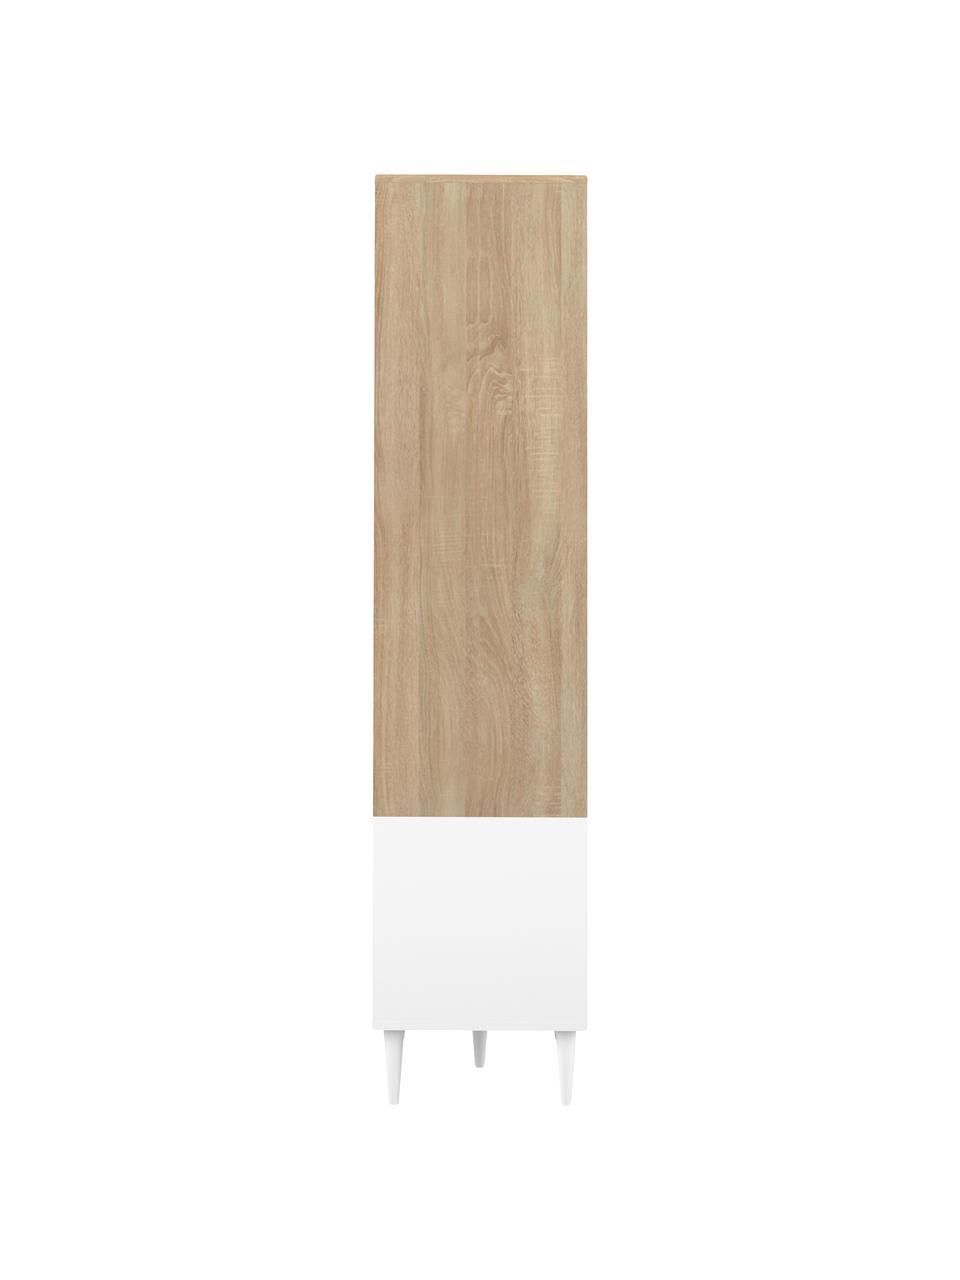 Standregal Horizon in Weiß mit Eichenholz-Optik, Füße: Buchenholz, massiv, lacki, Eichenholz, Weiß, 90 x 180 cm